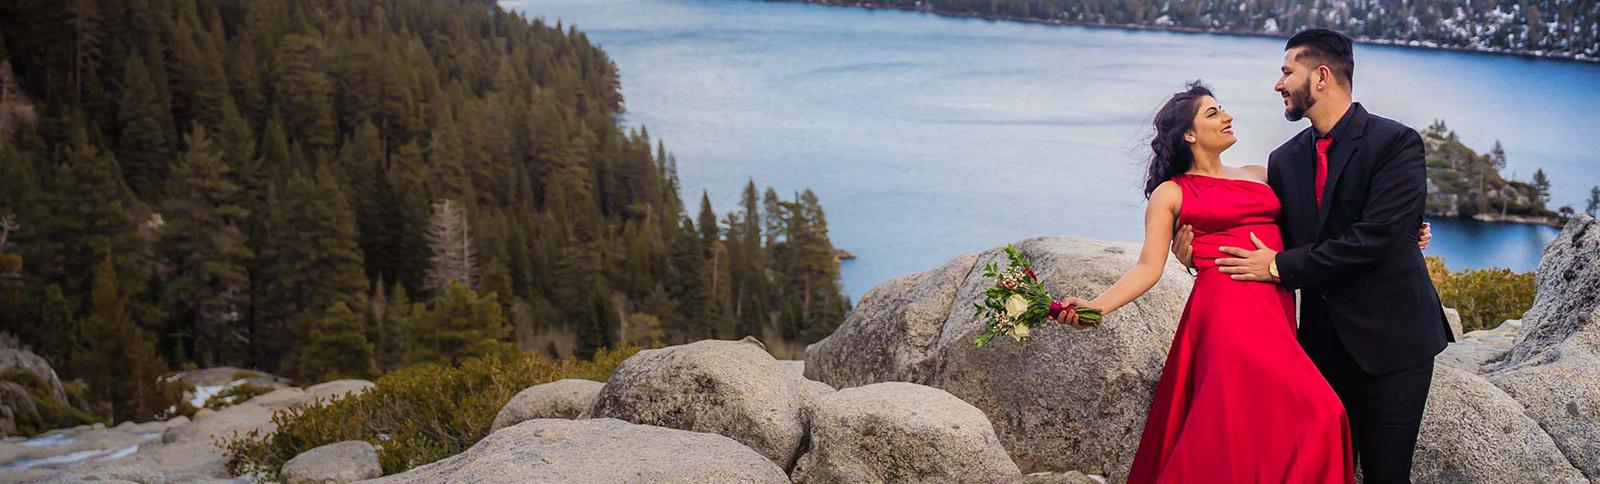 Lake Tahoe photographer Starscape Studios captures an engagement at Emerald Bay California